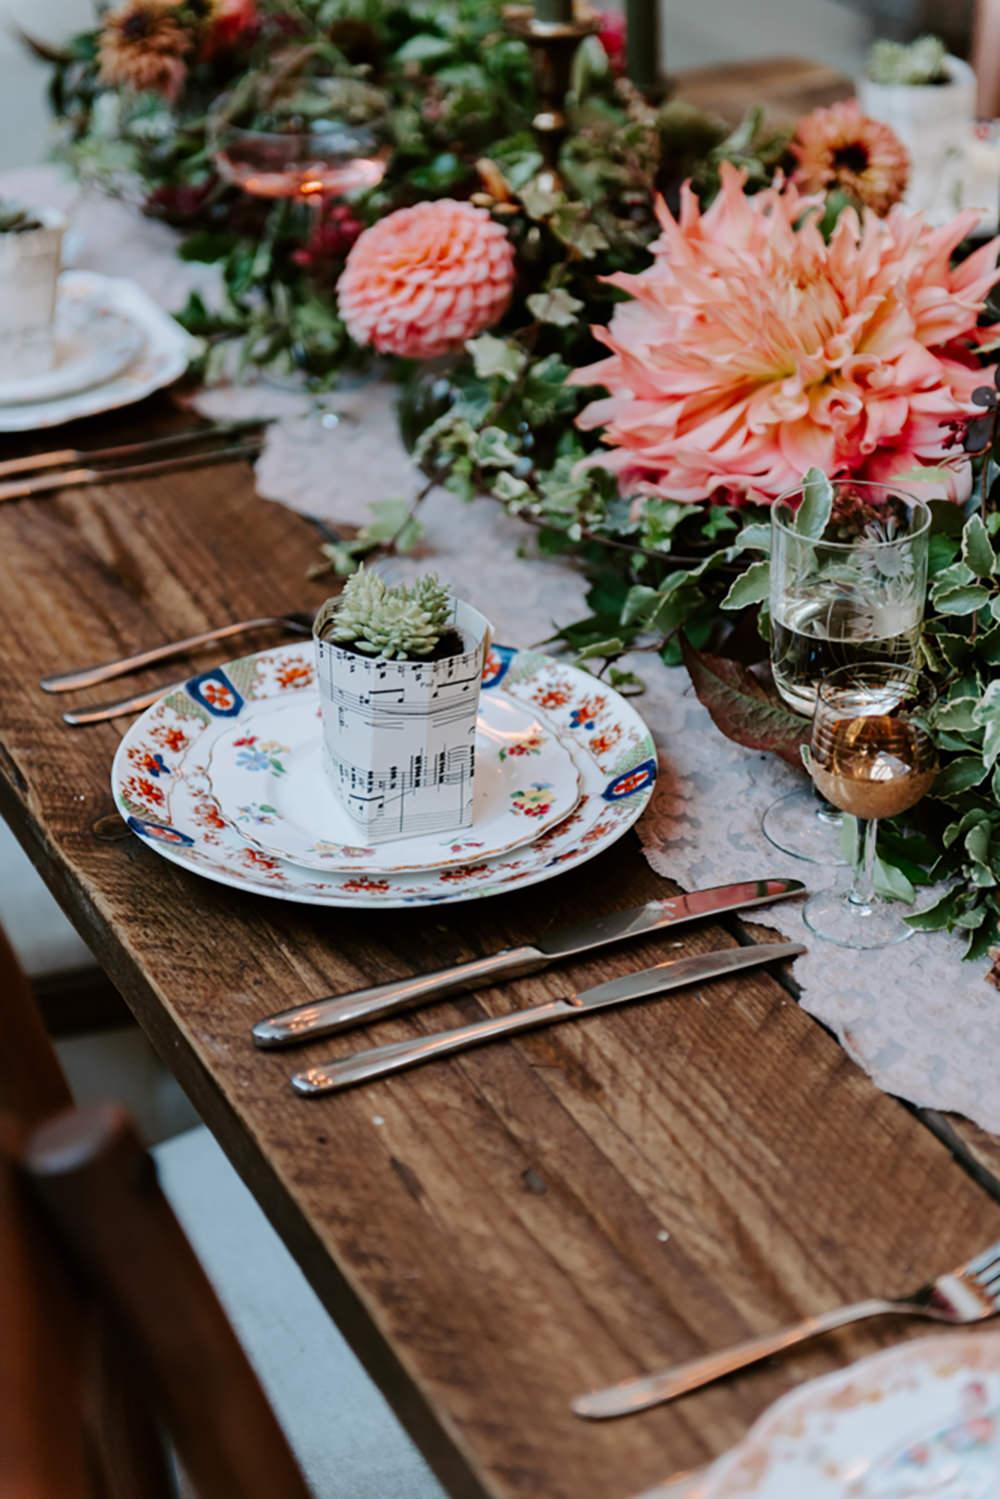 Place Setting Plate Floral Decor Ethical Wedding Ideas Sadie Osborne Photography